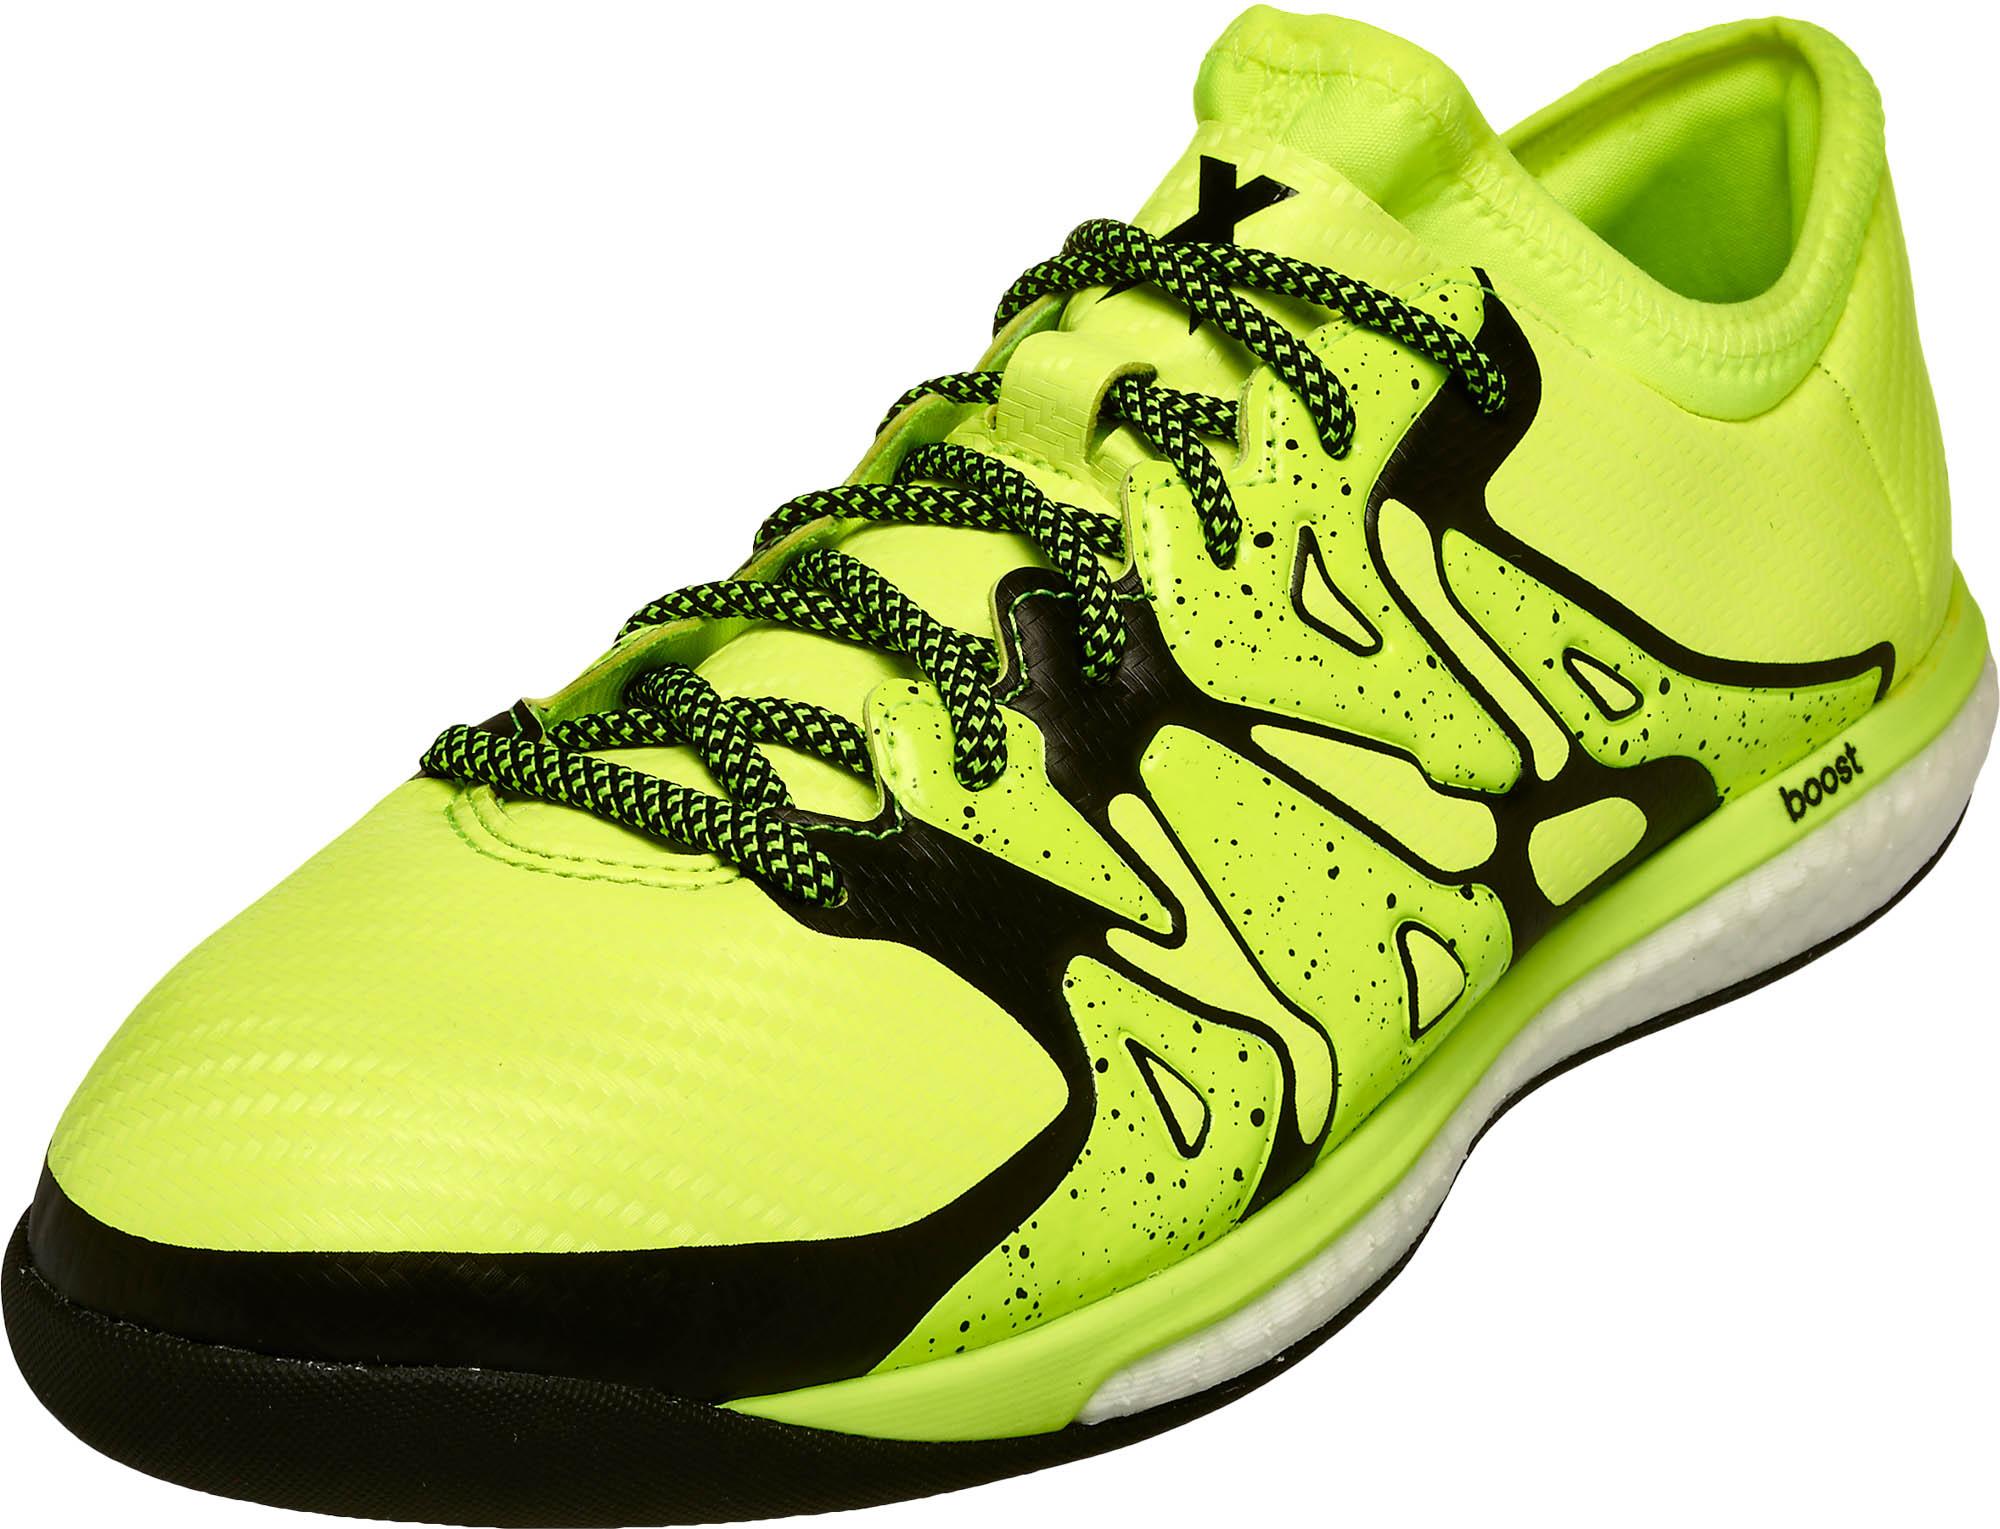 adidas boost futsal